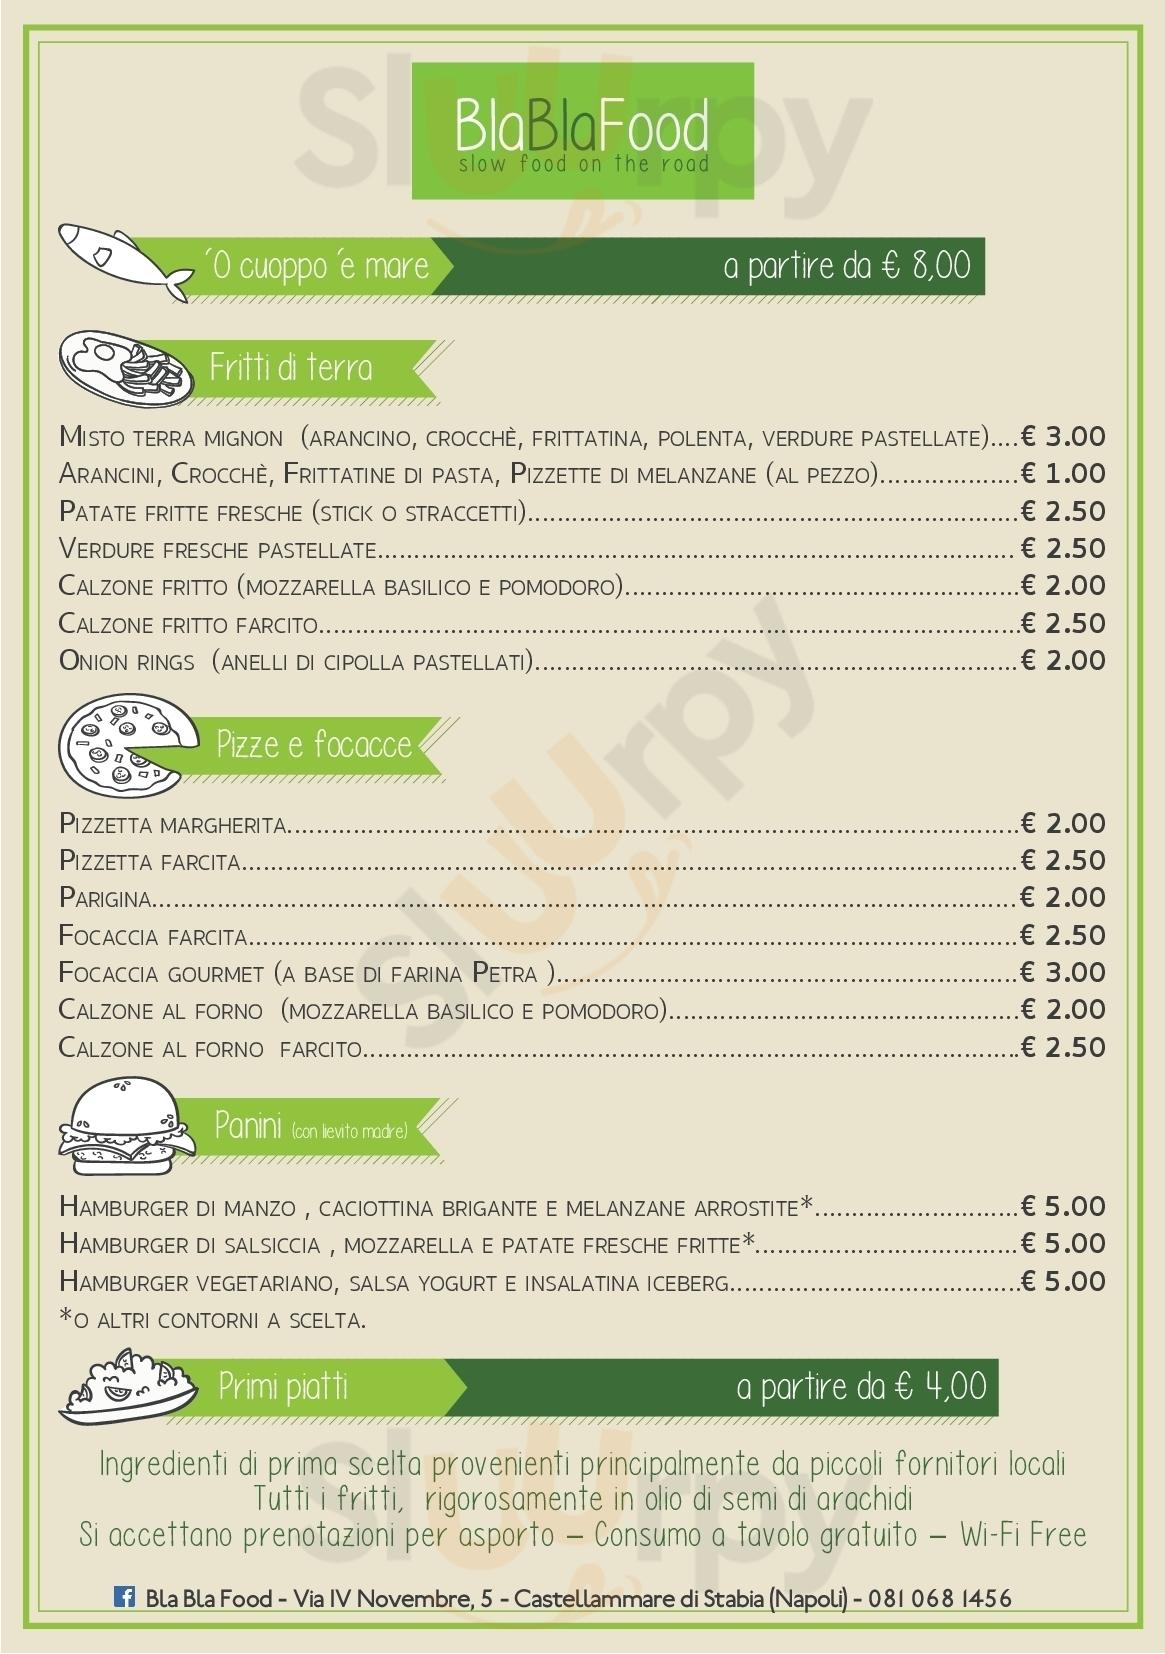 Bla Bla Food Castellammare Di Stabia menù 1 pagina